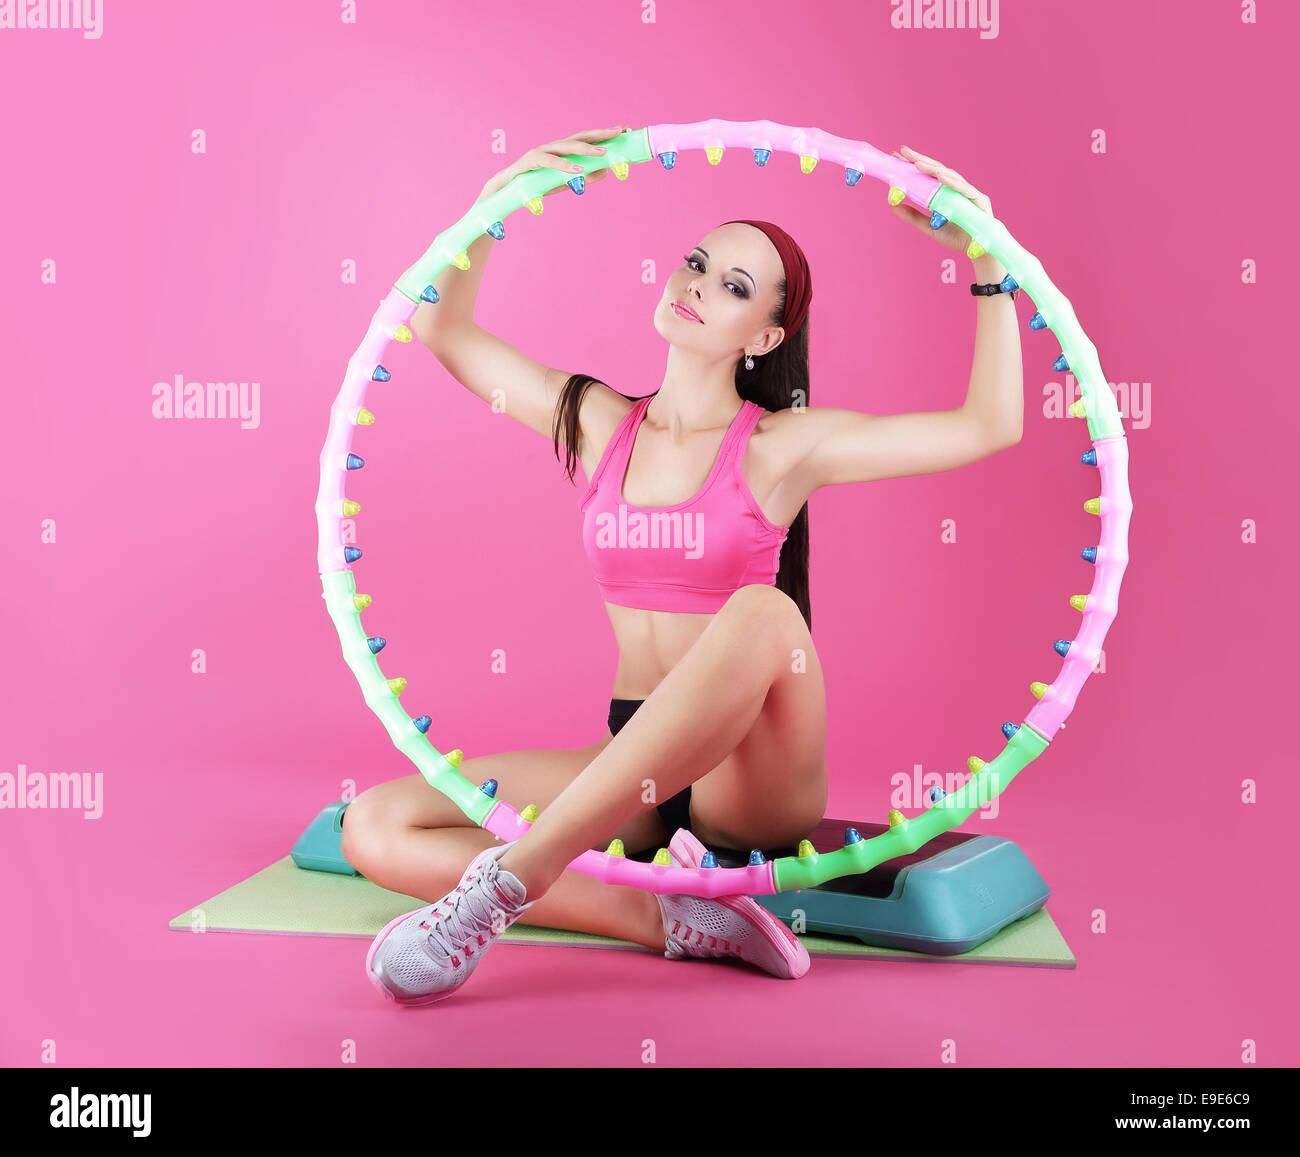 Wellness. Sportclub. Frau sitzt mit Sportgeräten Stockbild